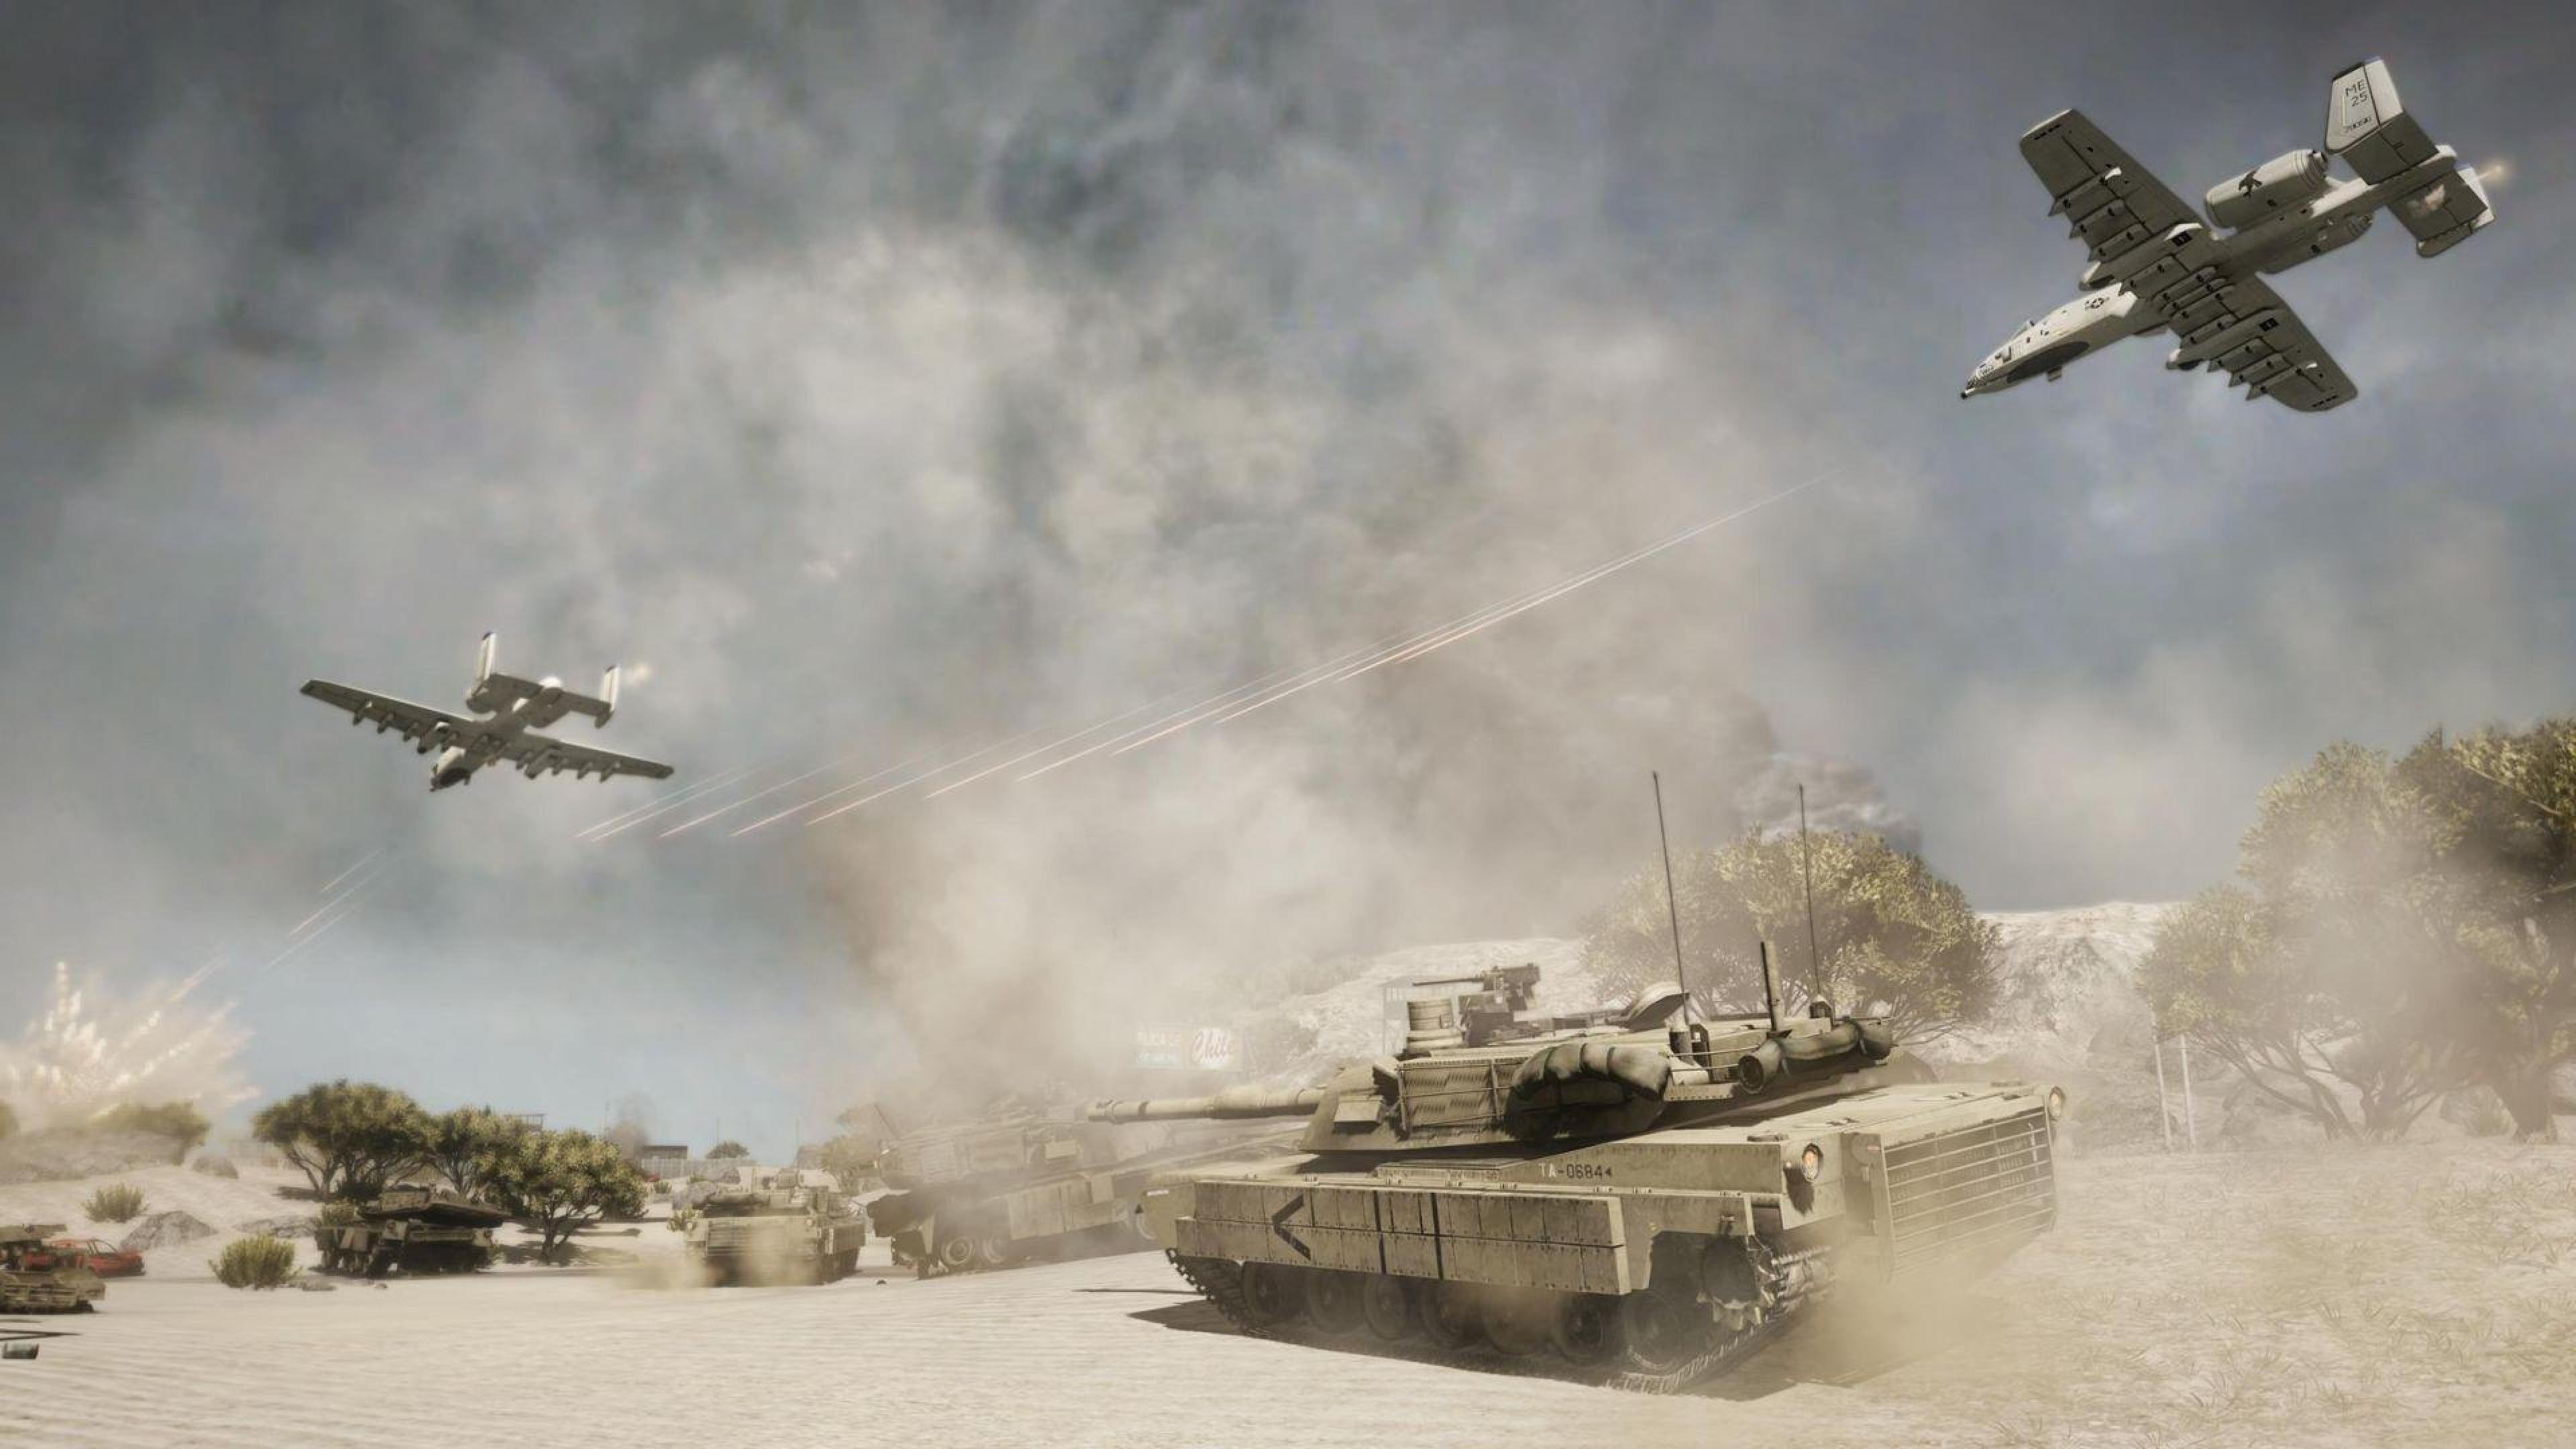 Wallpaper 3840x2160 battlefield aviation tanks fire smoke 4K 3840x2160